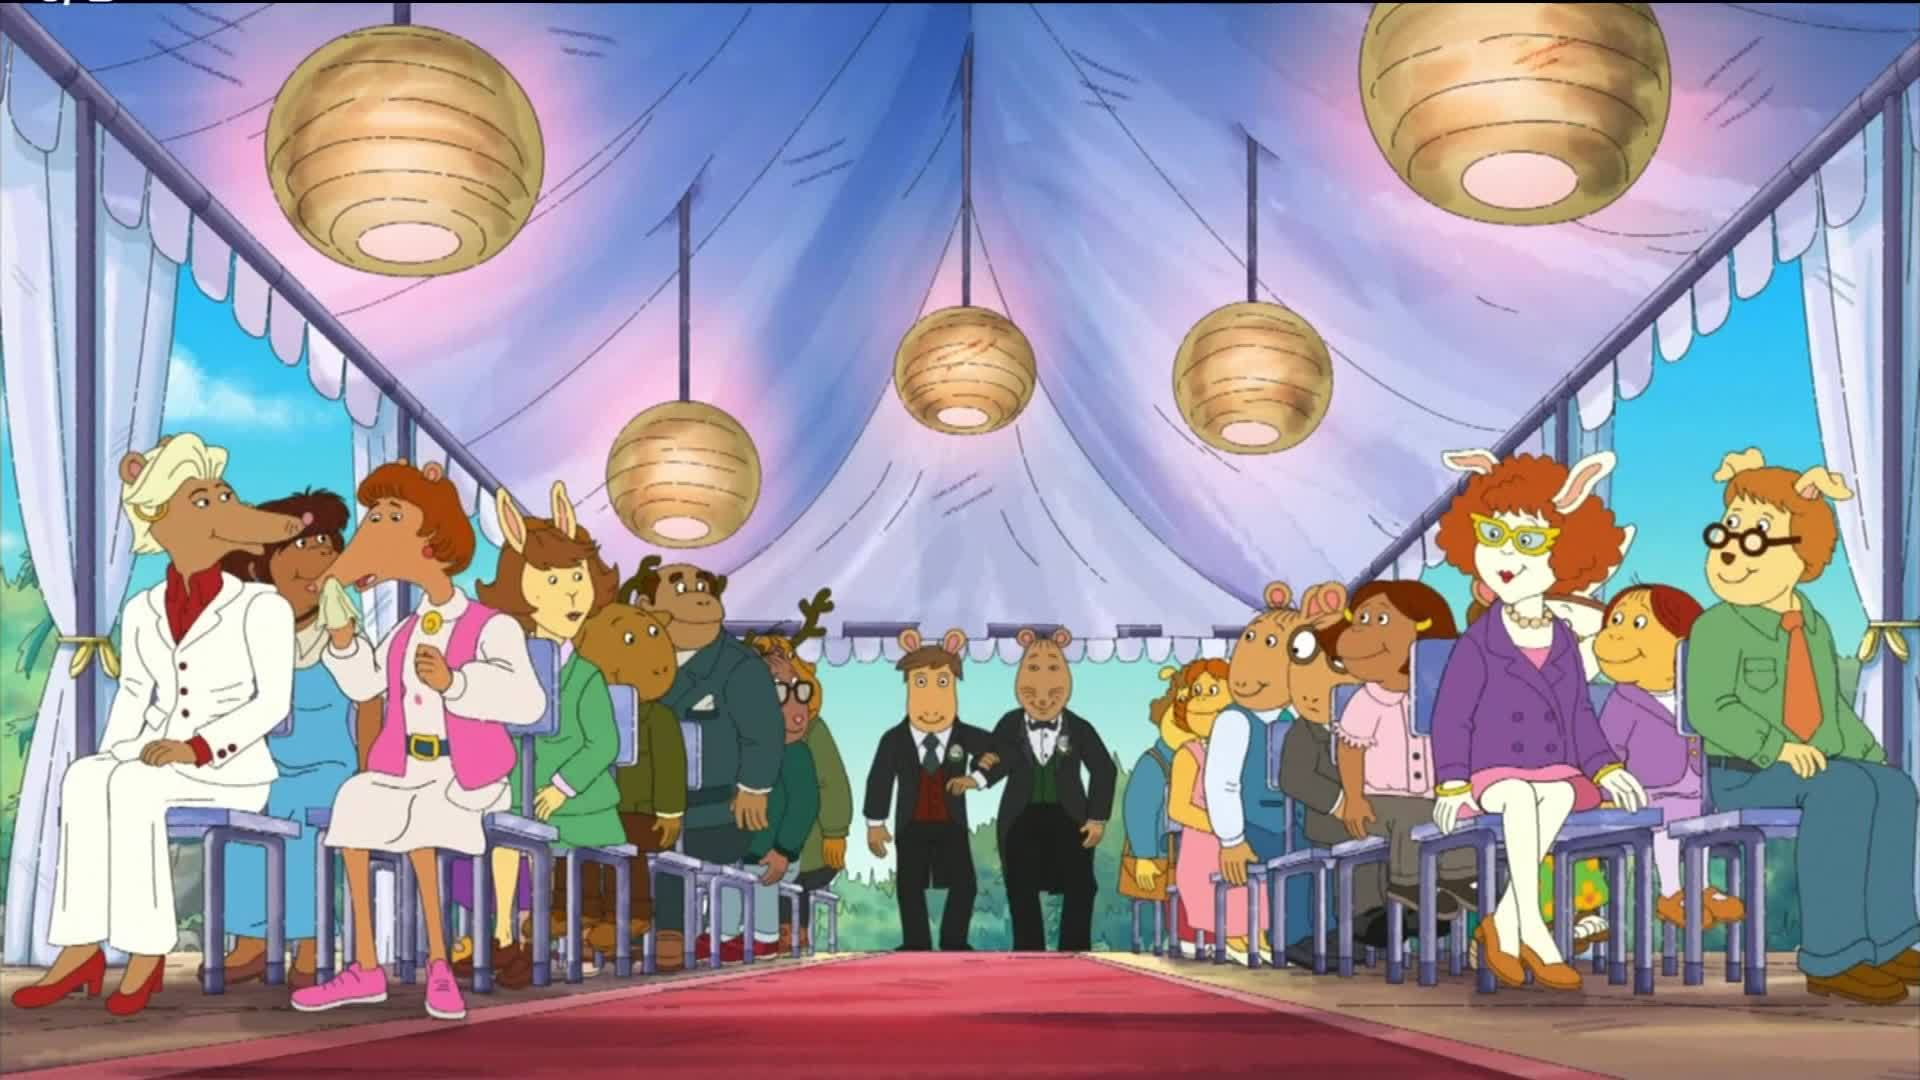 _Arthur__gay_wedding_episode_banned_in_A_0_20190522115832-846653543